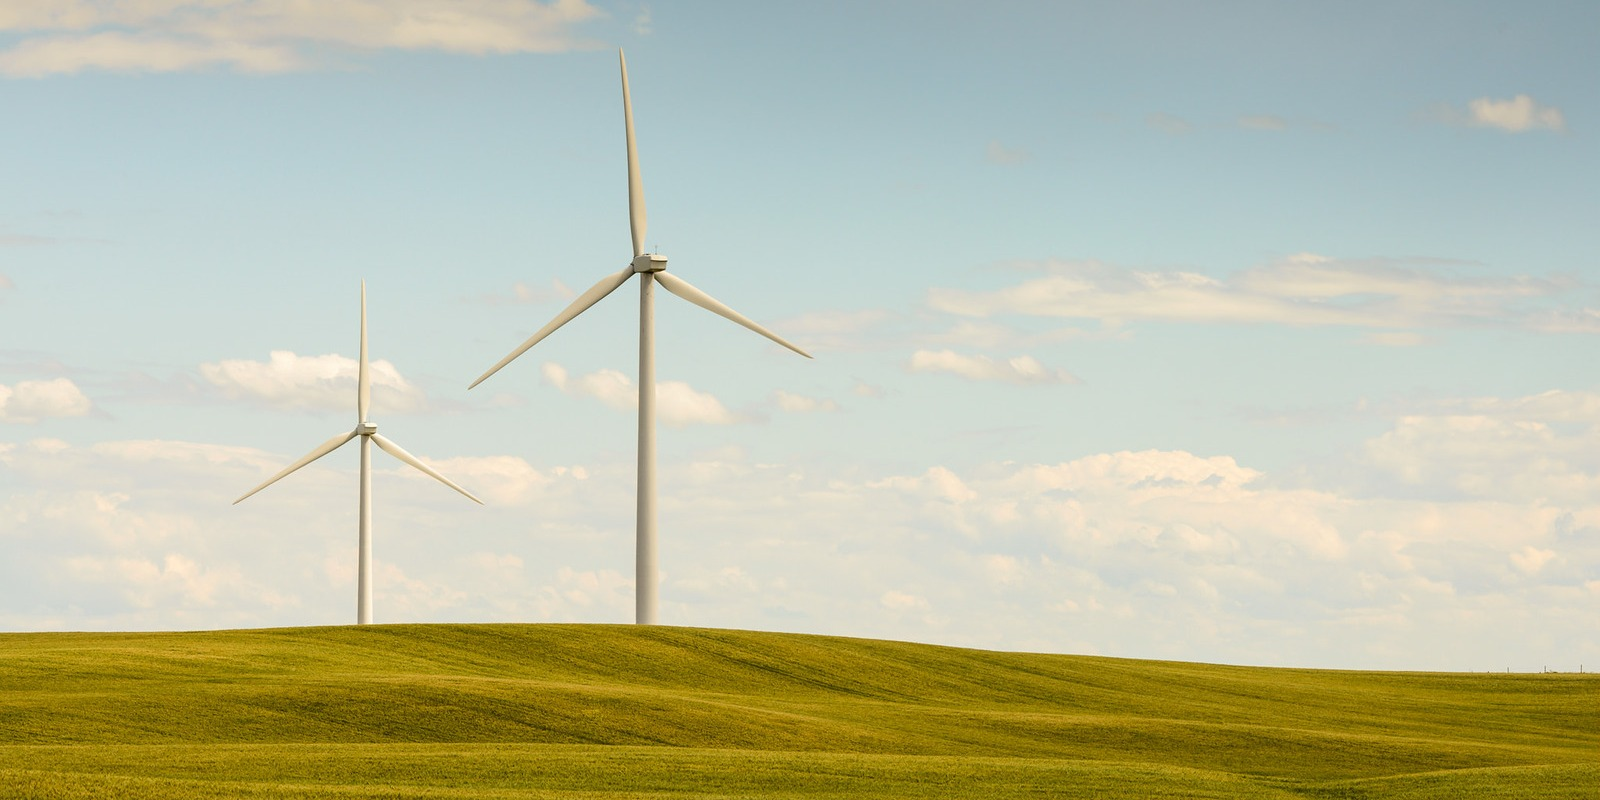 Wayne Stadler Photo Wind Power Alberta 2015-07-26